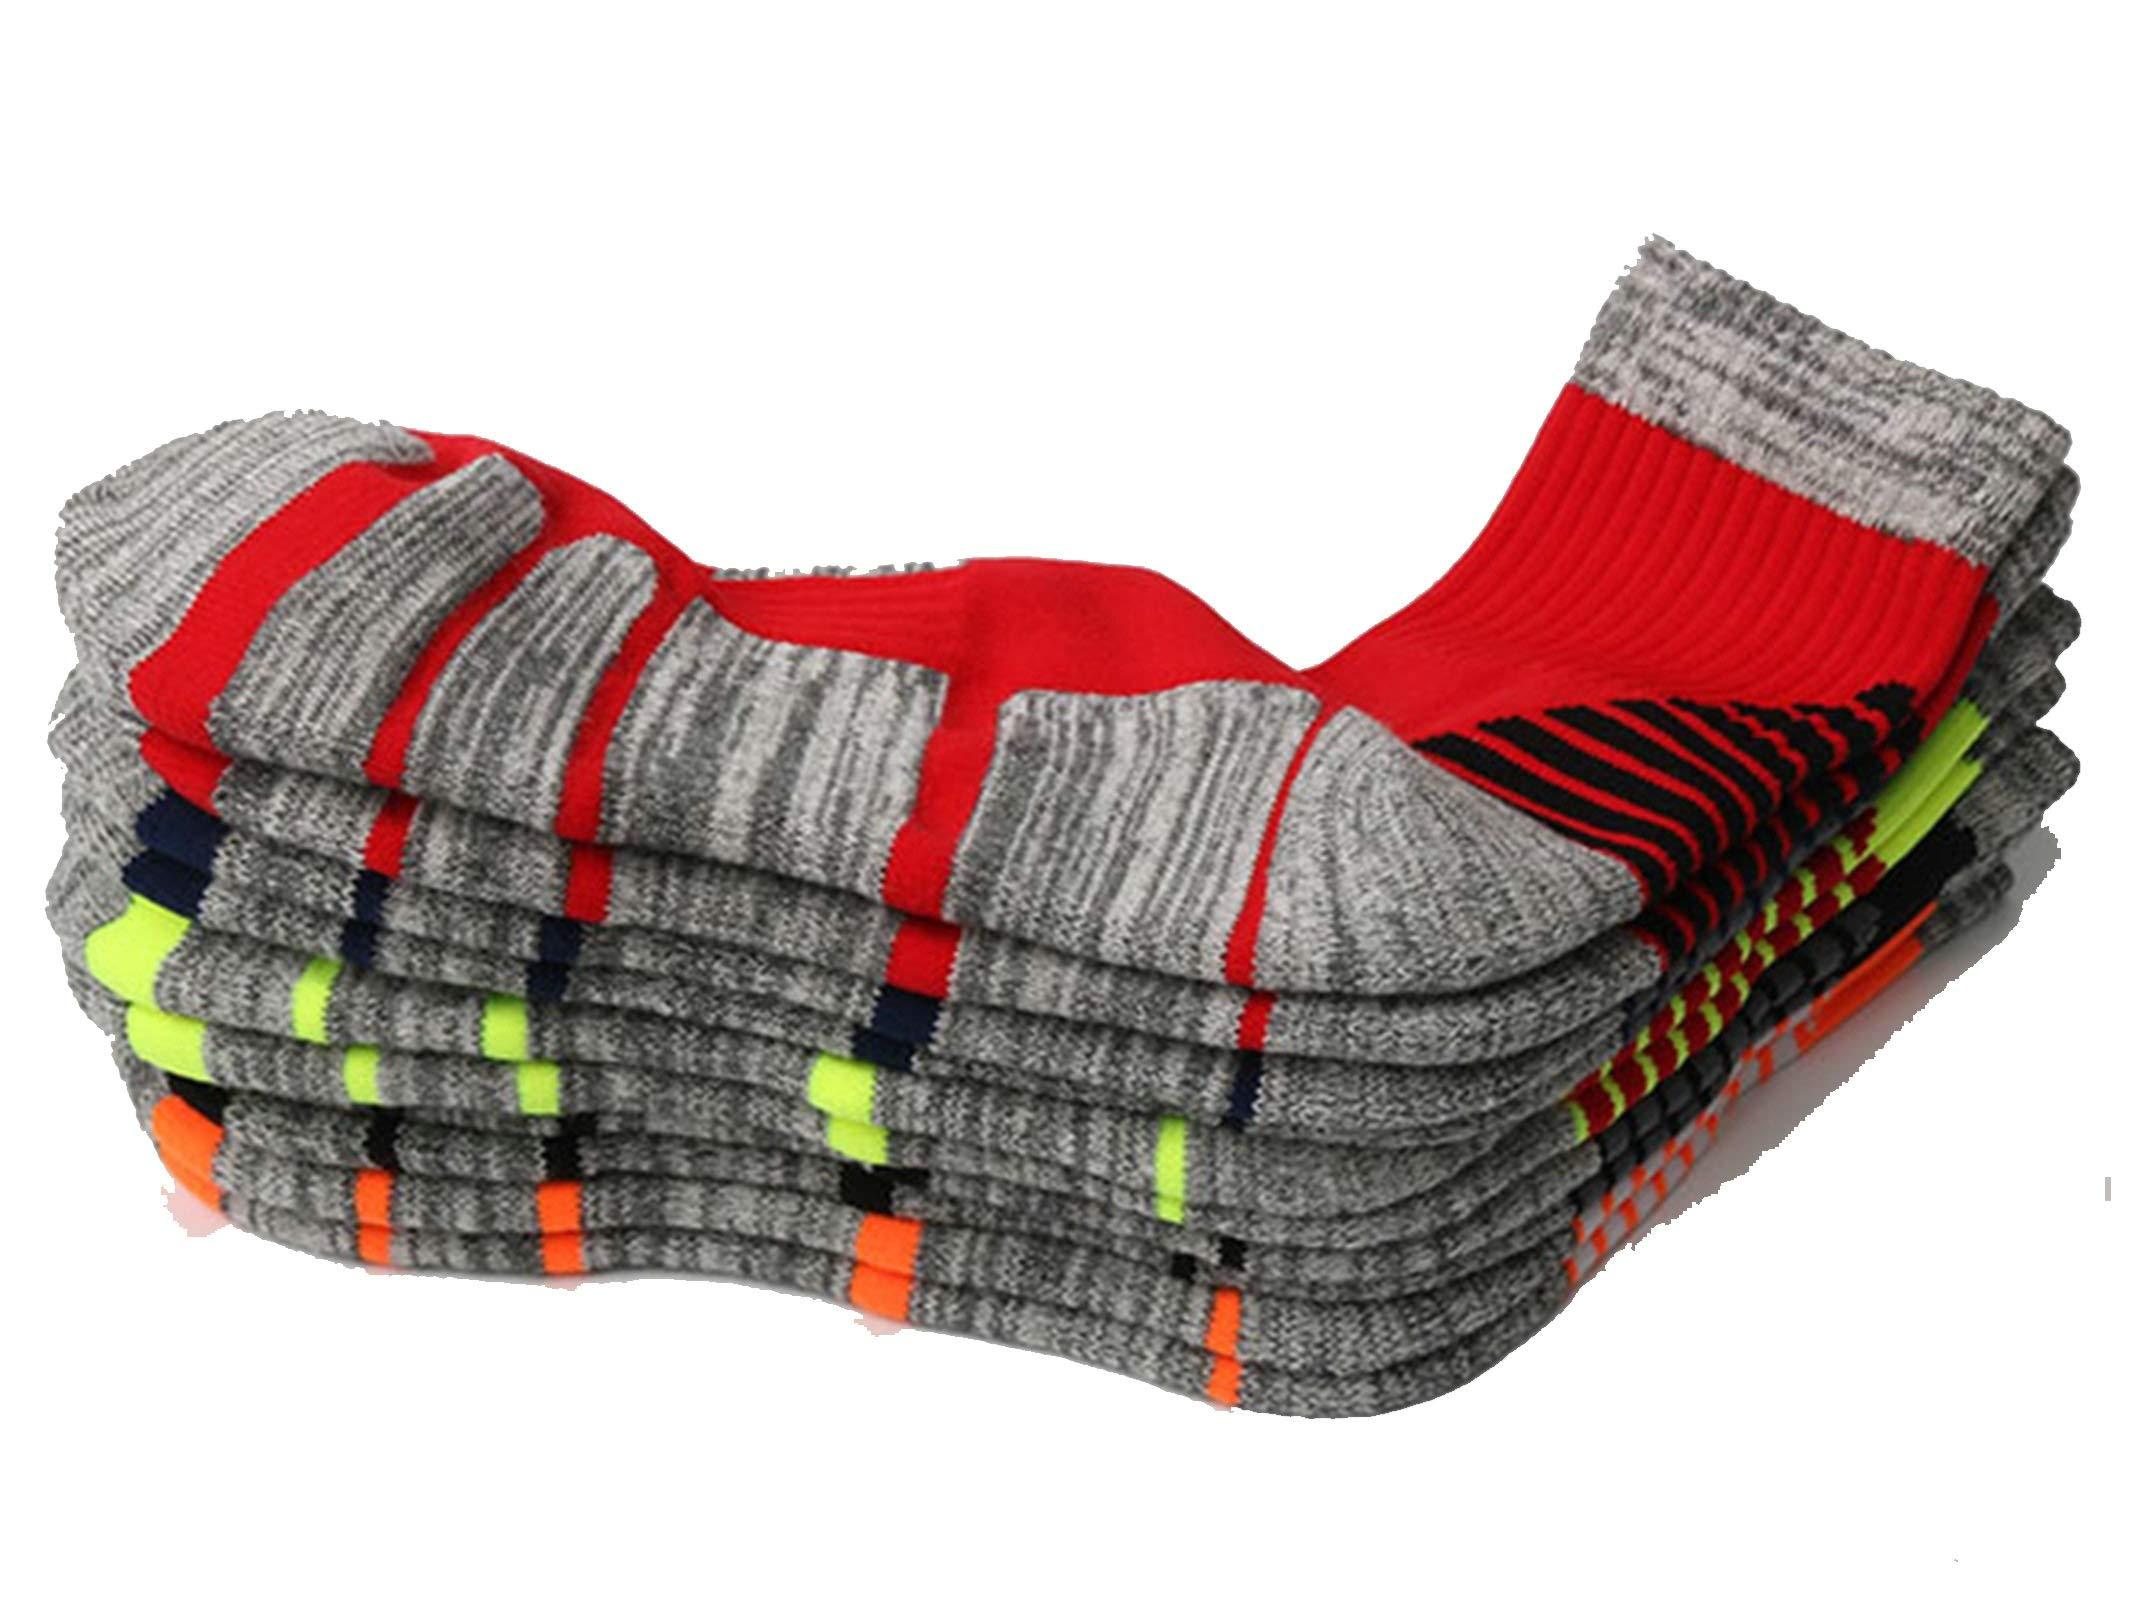 Thick Hiking Hiking Socks Suction Sweat Fall Winter Size L 39-45 Red Black Orange Black Orange 5Pair